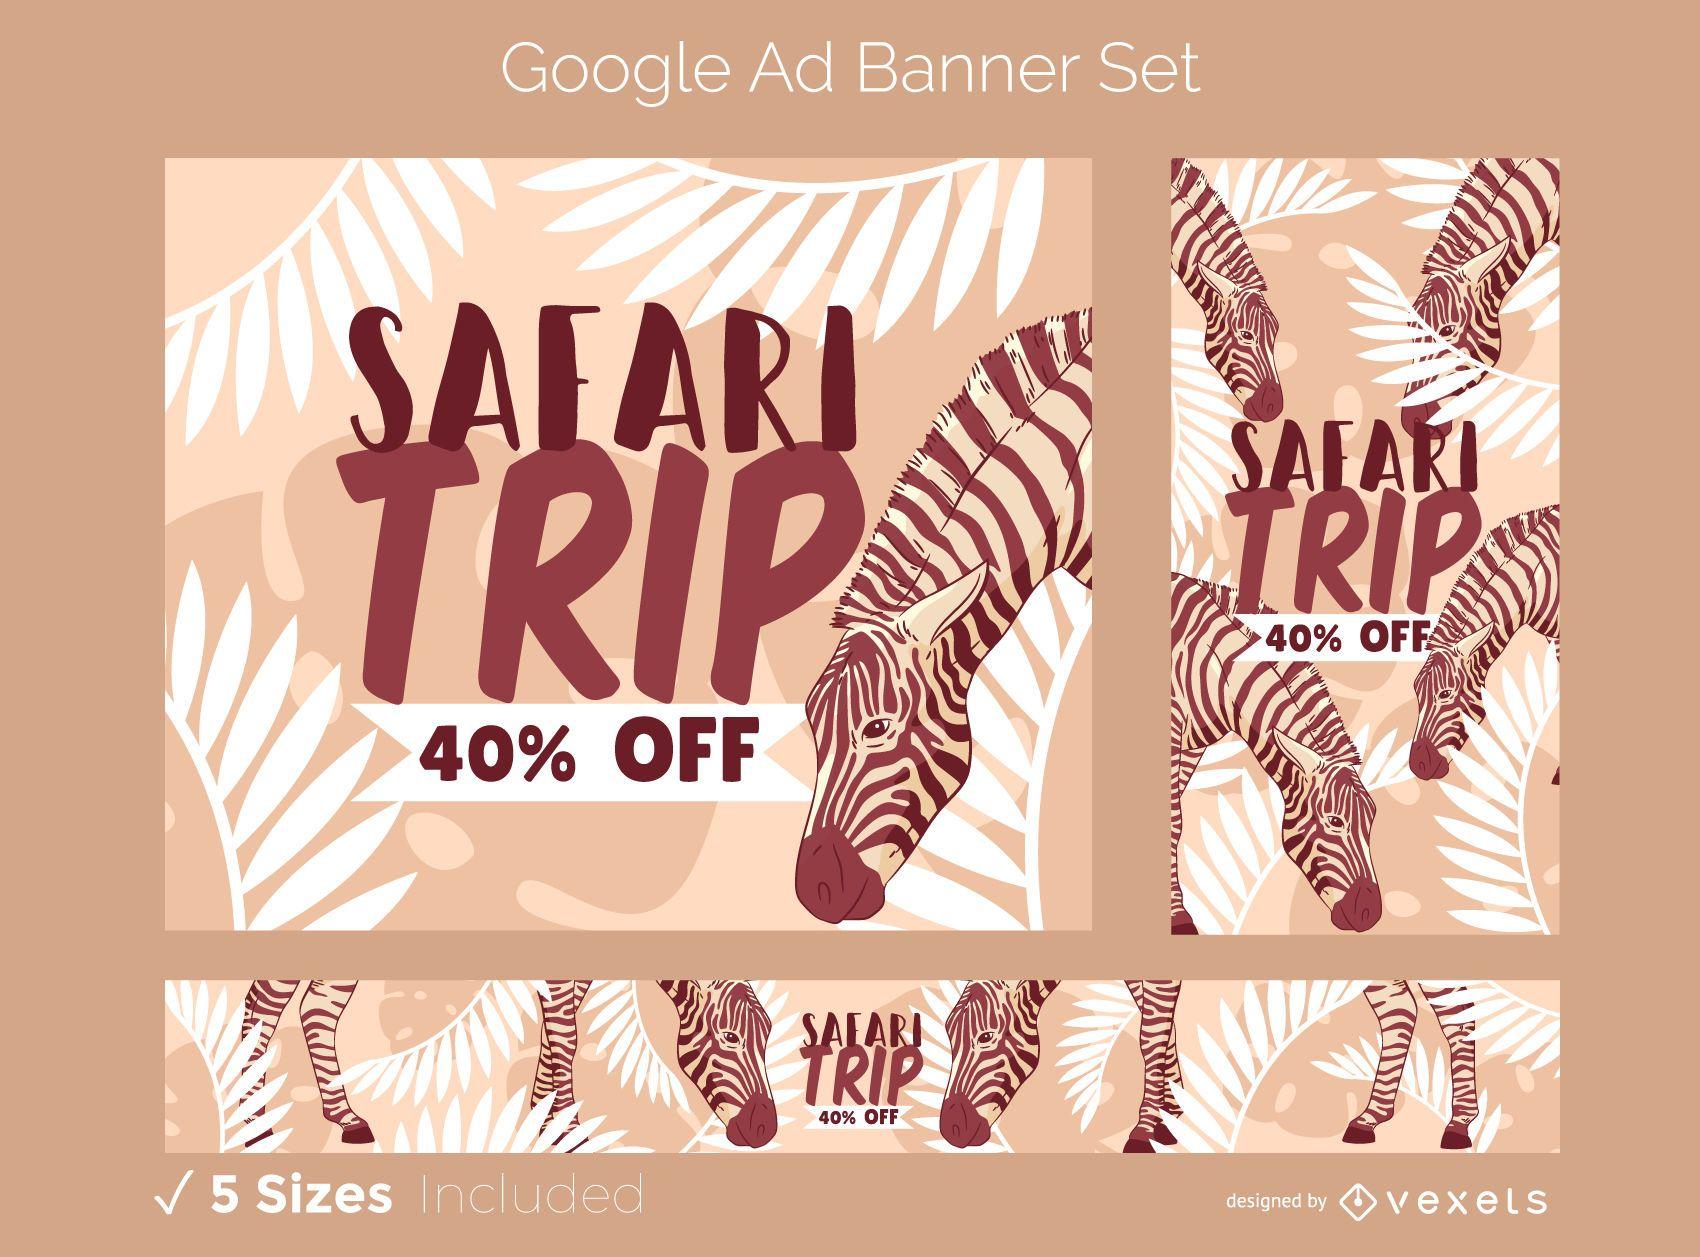 Conjunto de design de anúncios do Google Safari Trip